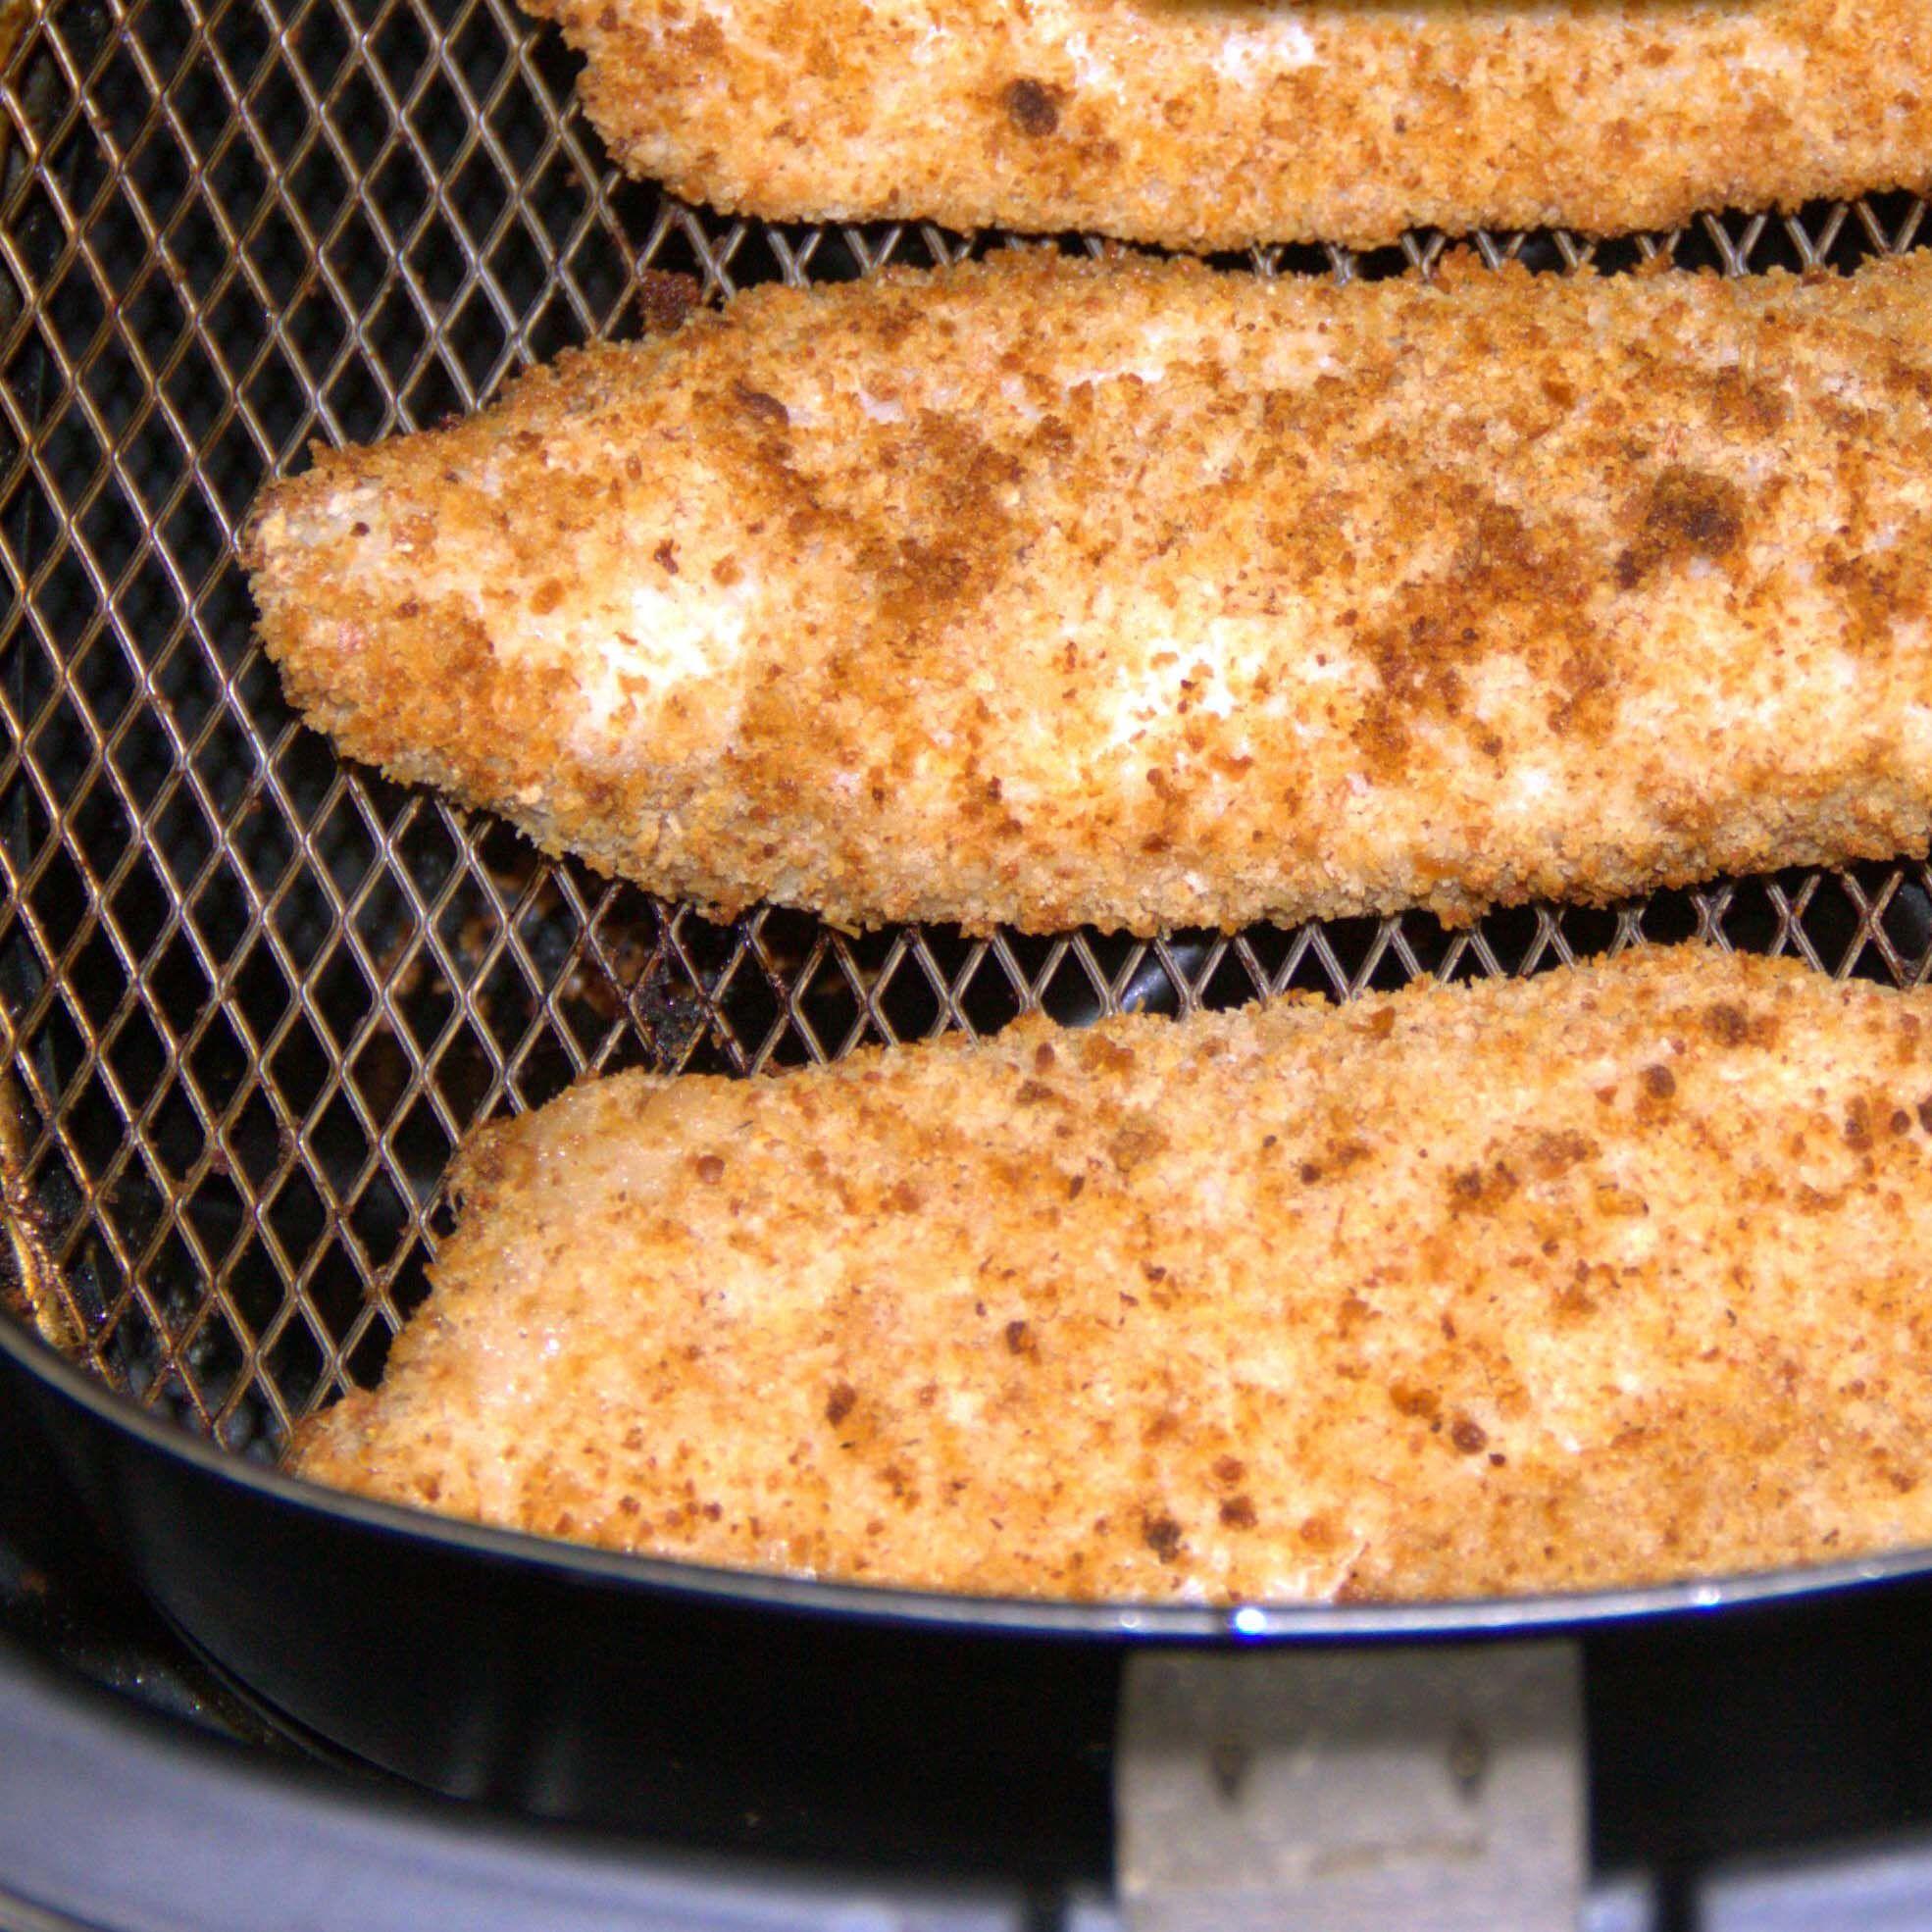 Air Fried Crumbed Fish Recipe Air fryer fish recipes